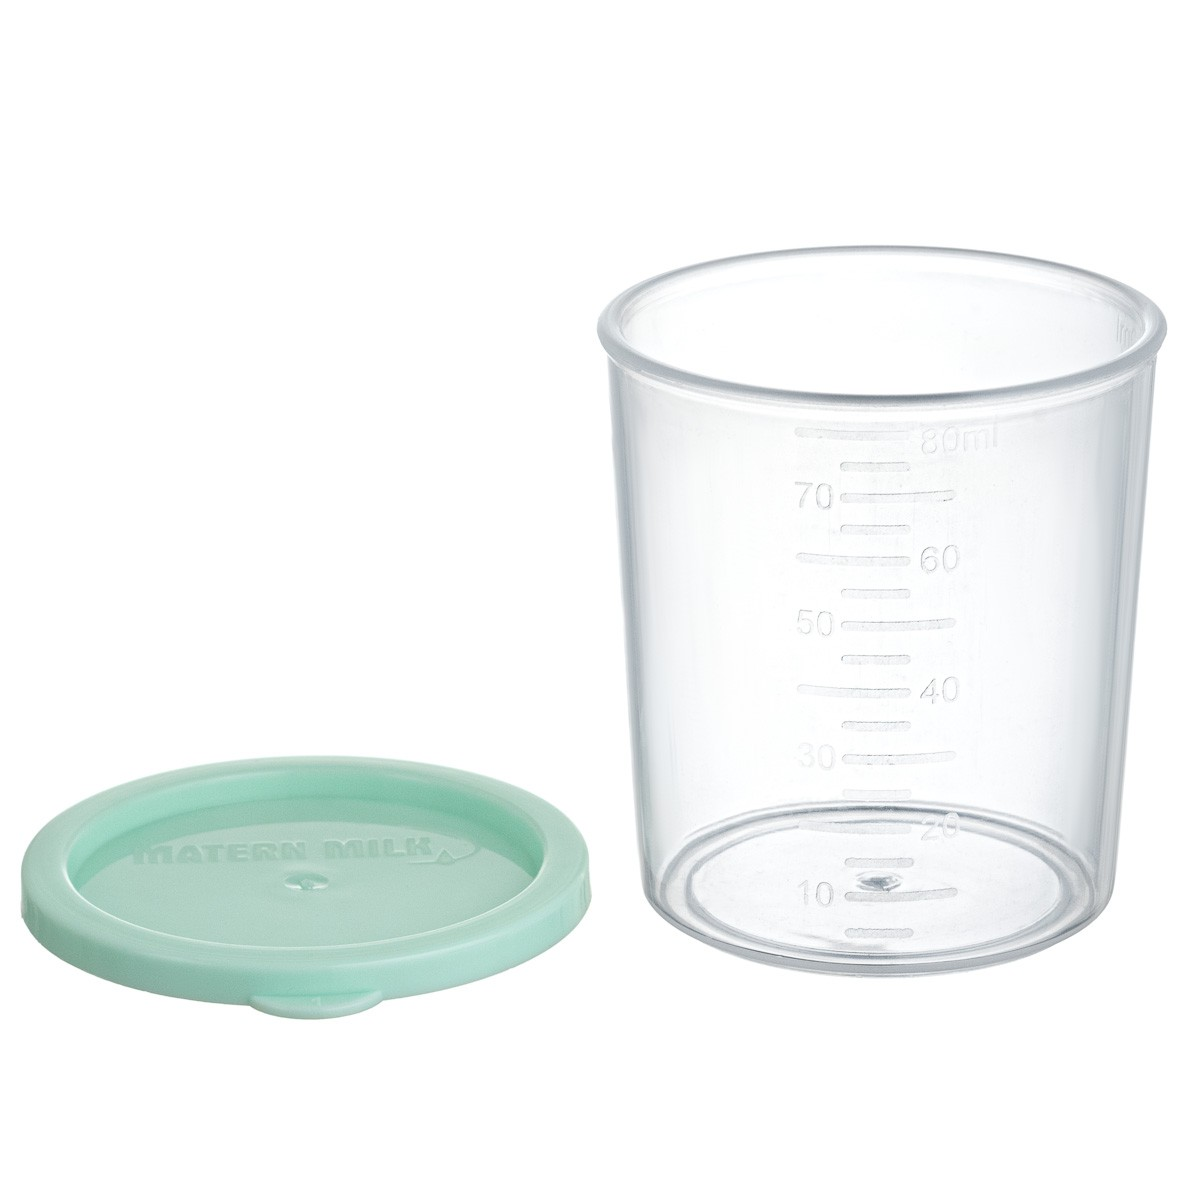 Kit 250  Copos Para Armazenamento de Leite Materno - 80 ml  (a granel)  - Matern Milk